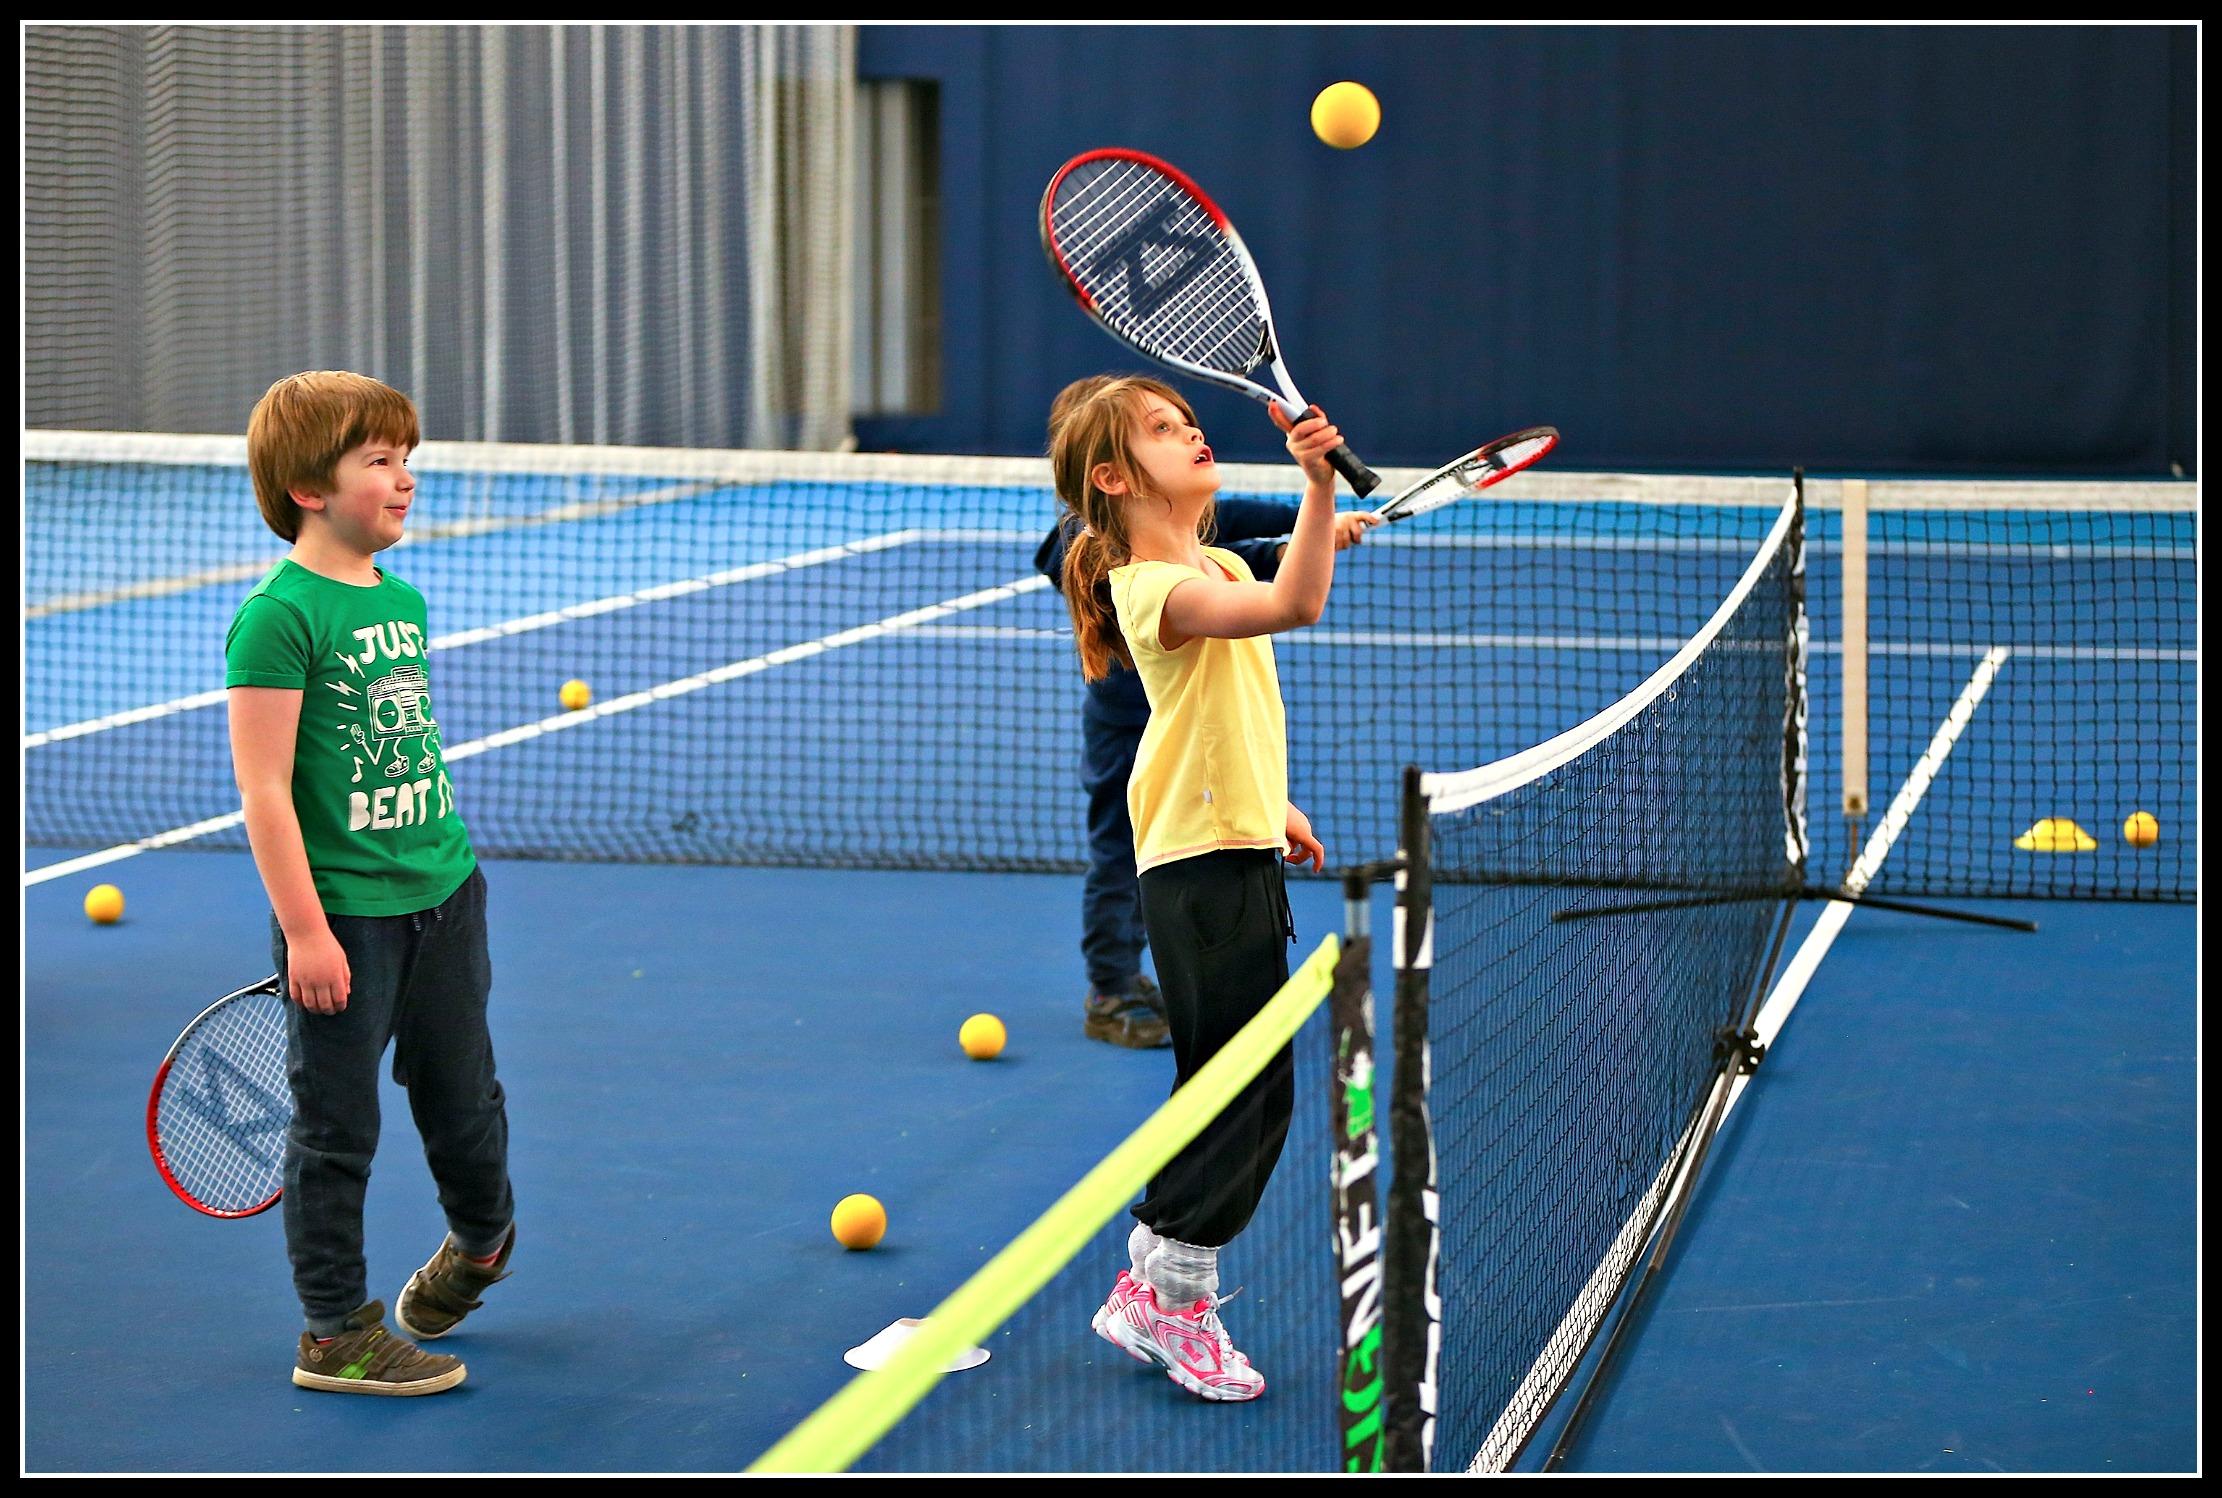 The fun way of introducing kids to tennis